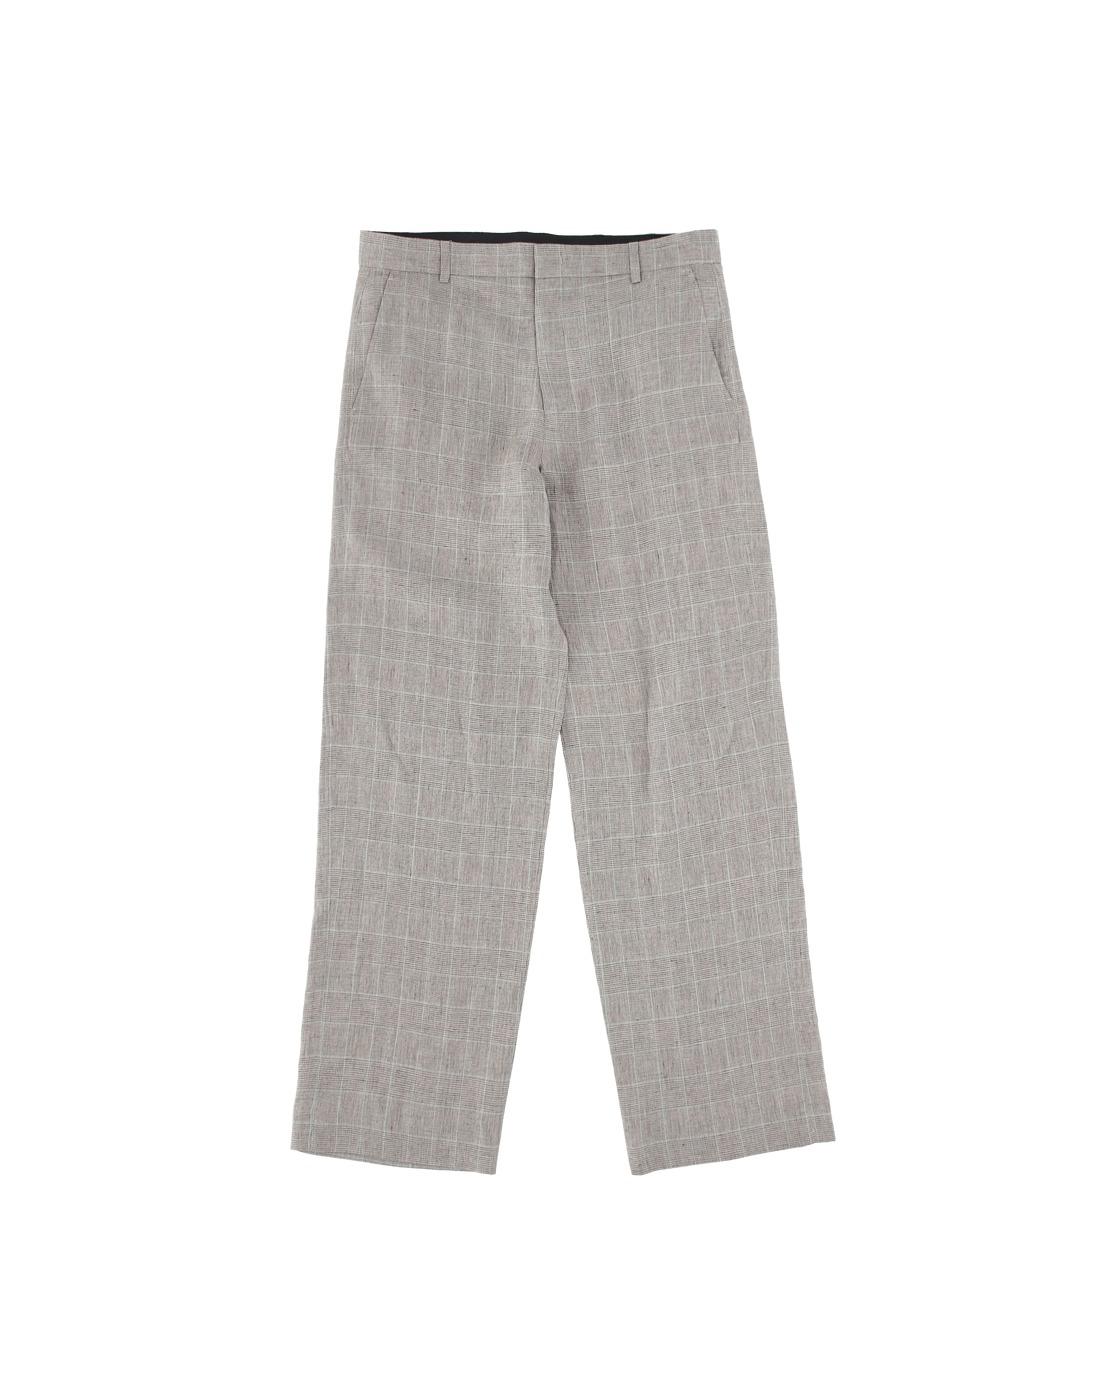 Aries Hybrid Trousers Grey/Aqua